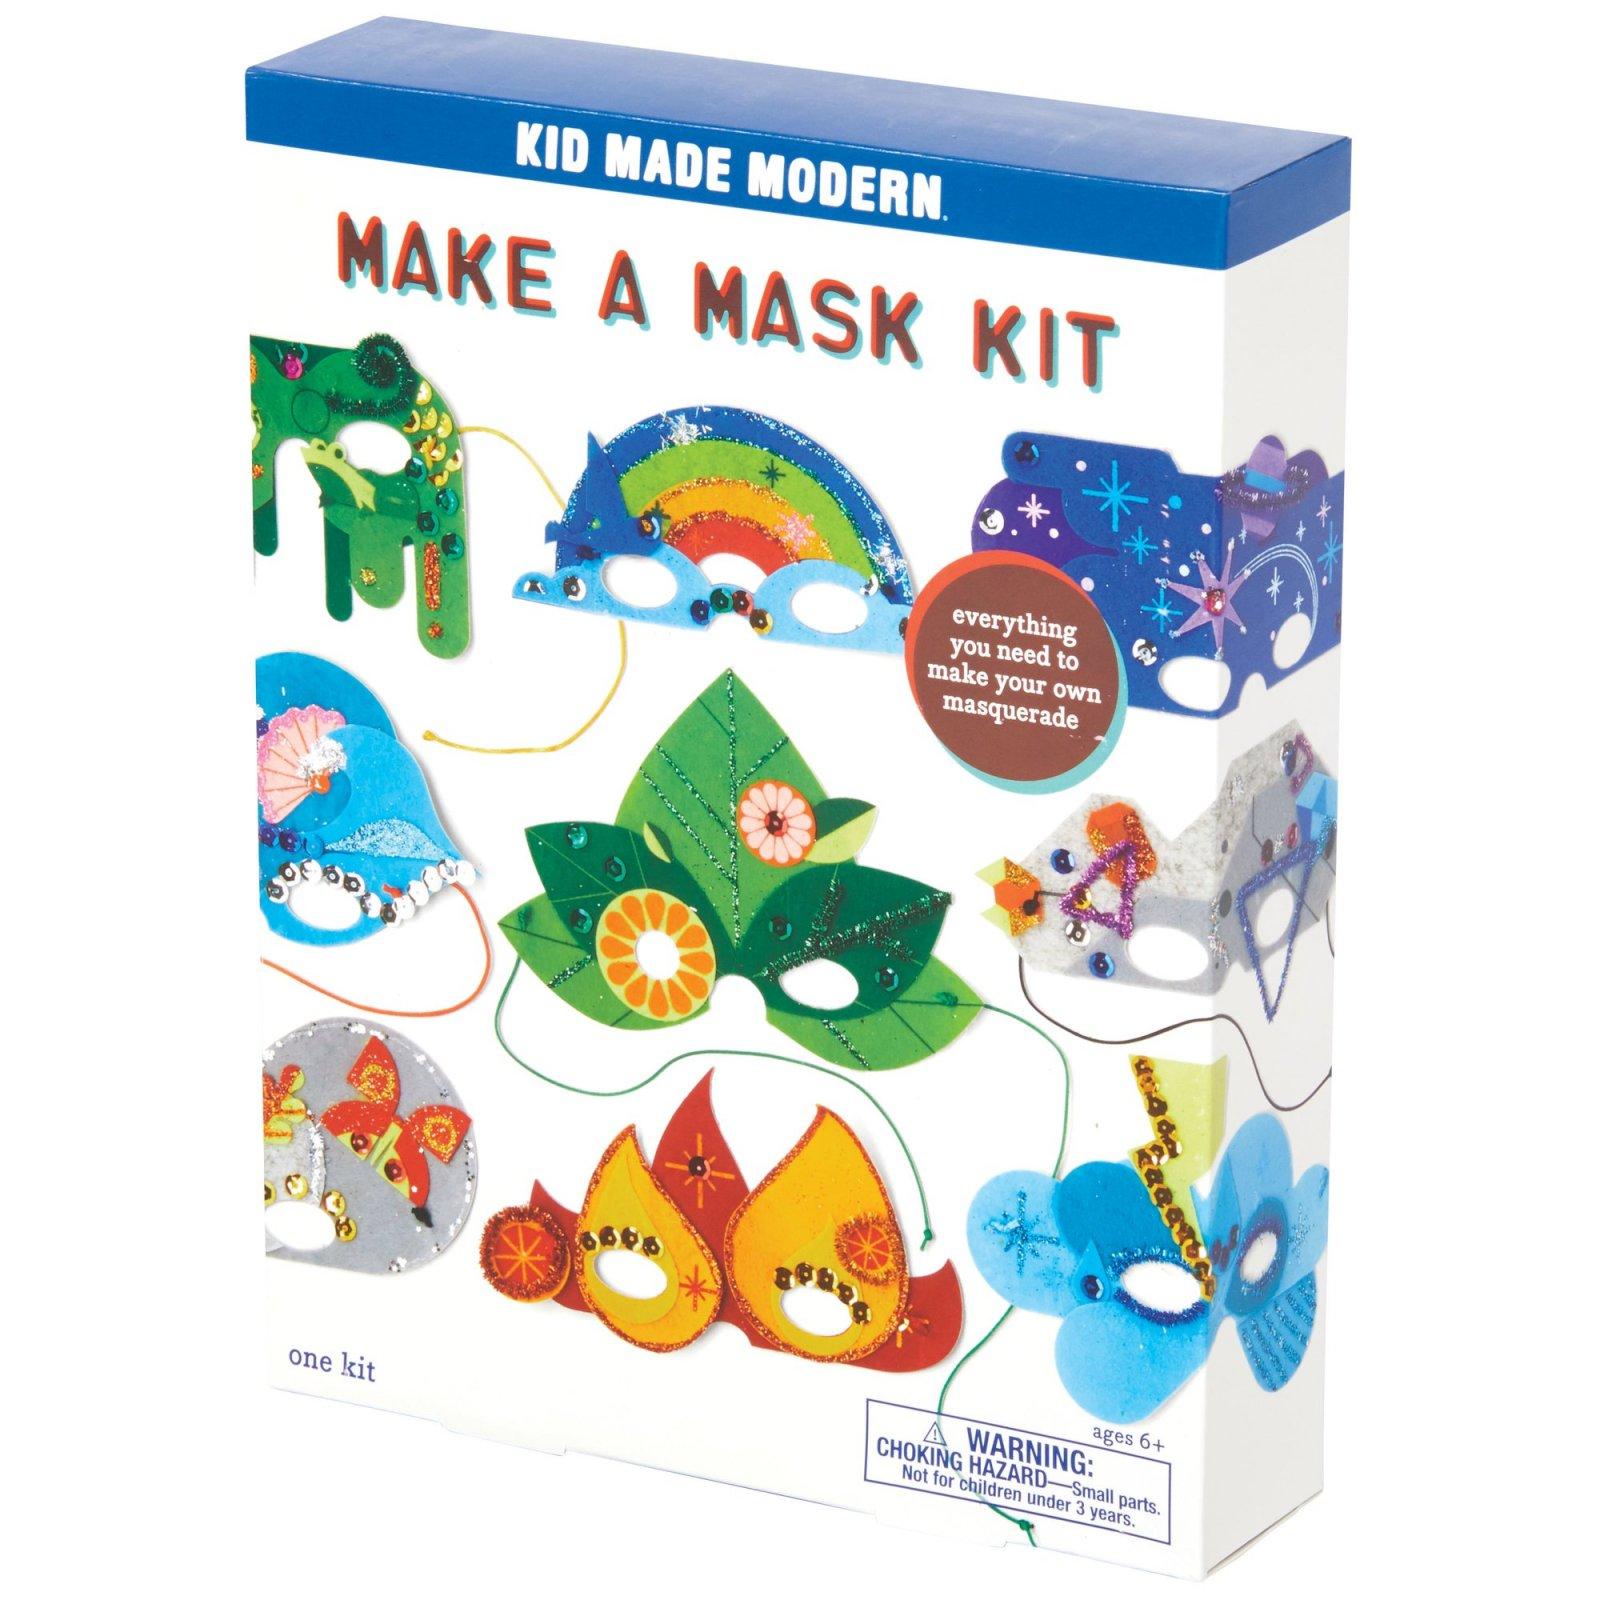 Make a Mask Kit by Kid Made Modern